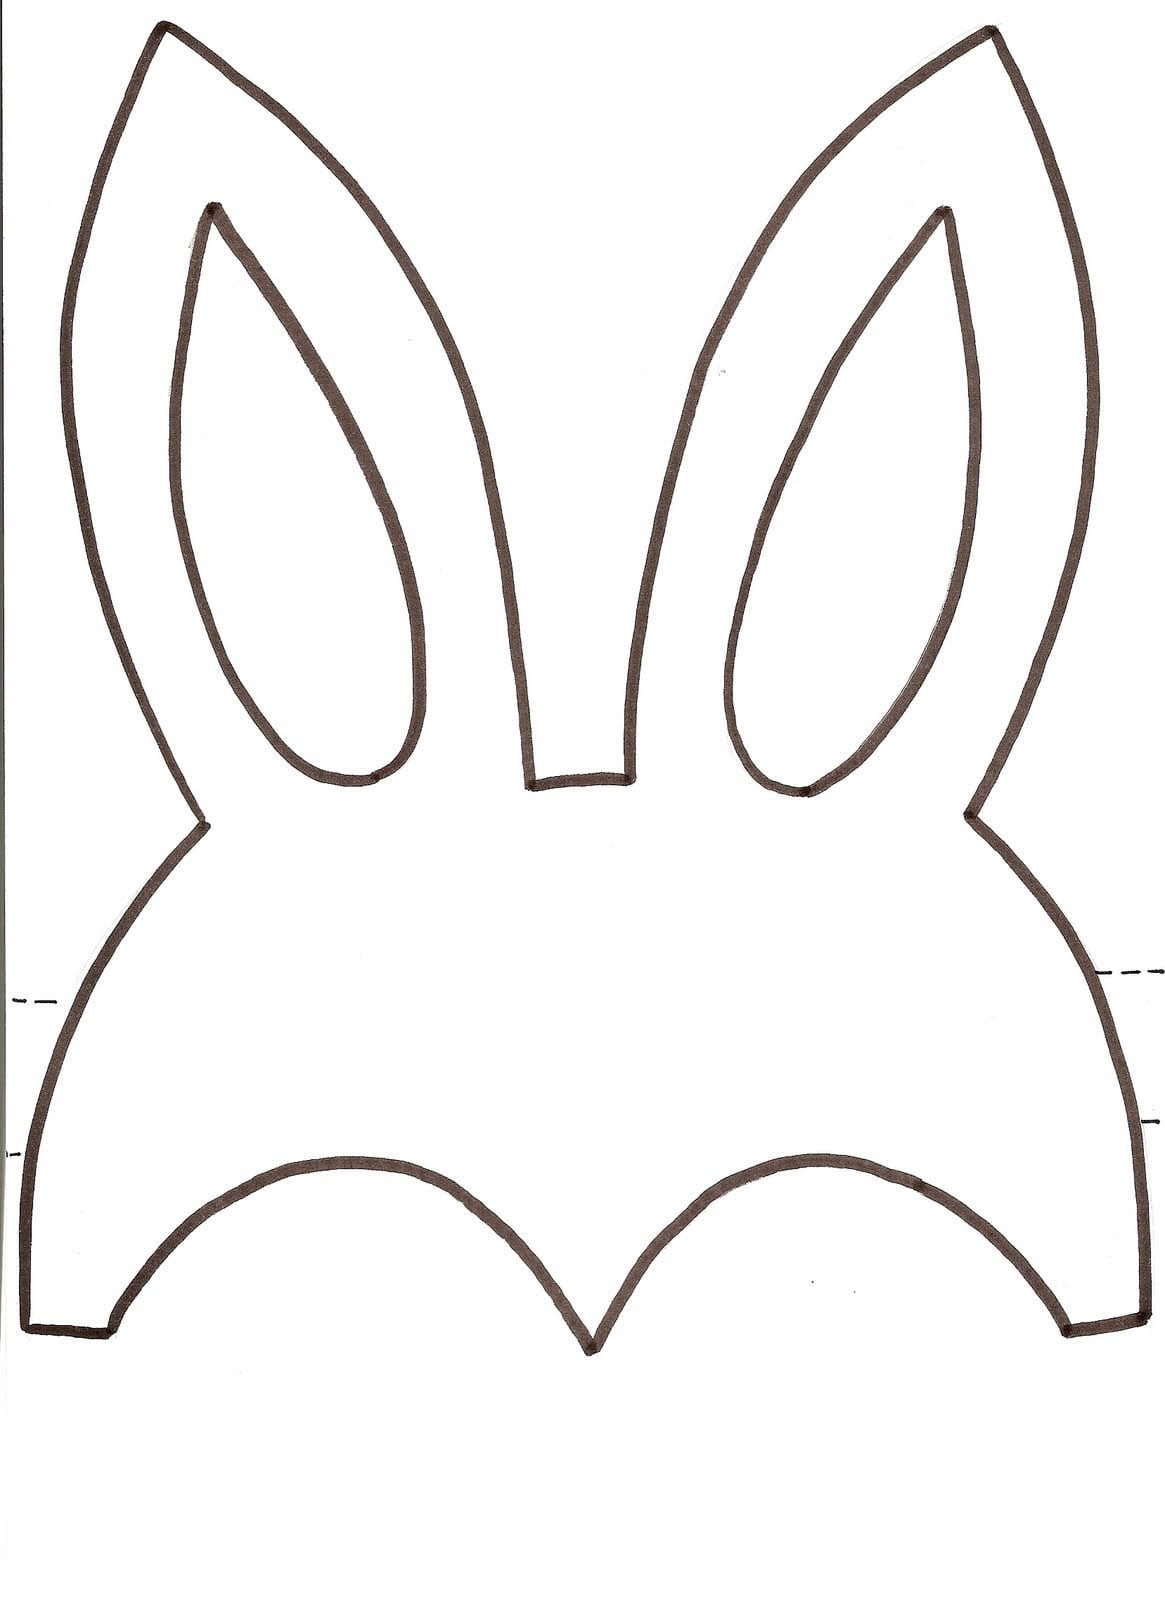 Desenho De Máscara De Orelhas De Coelho Da Páscoa Para Colorir